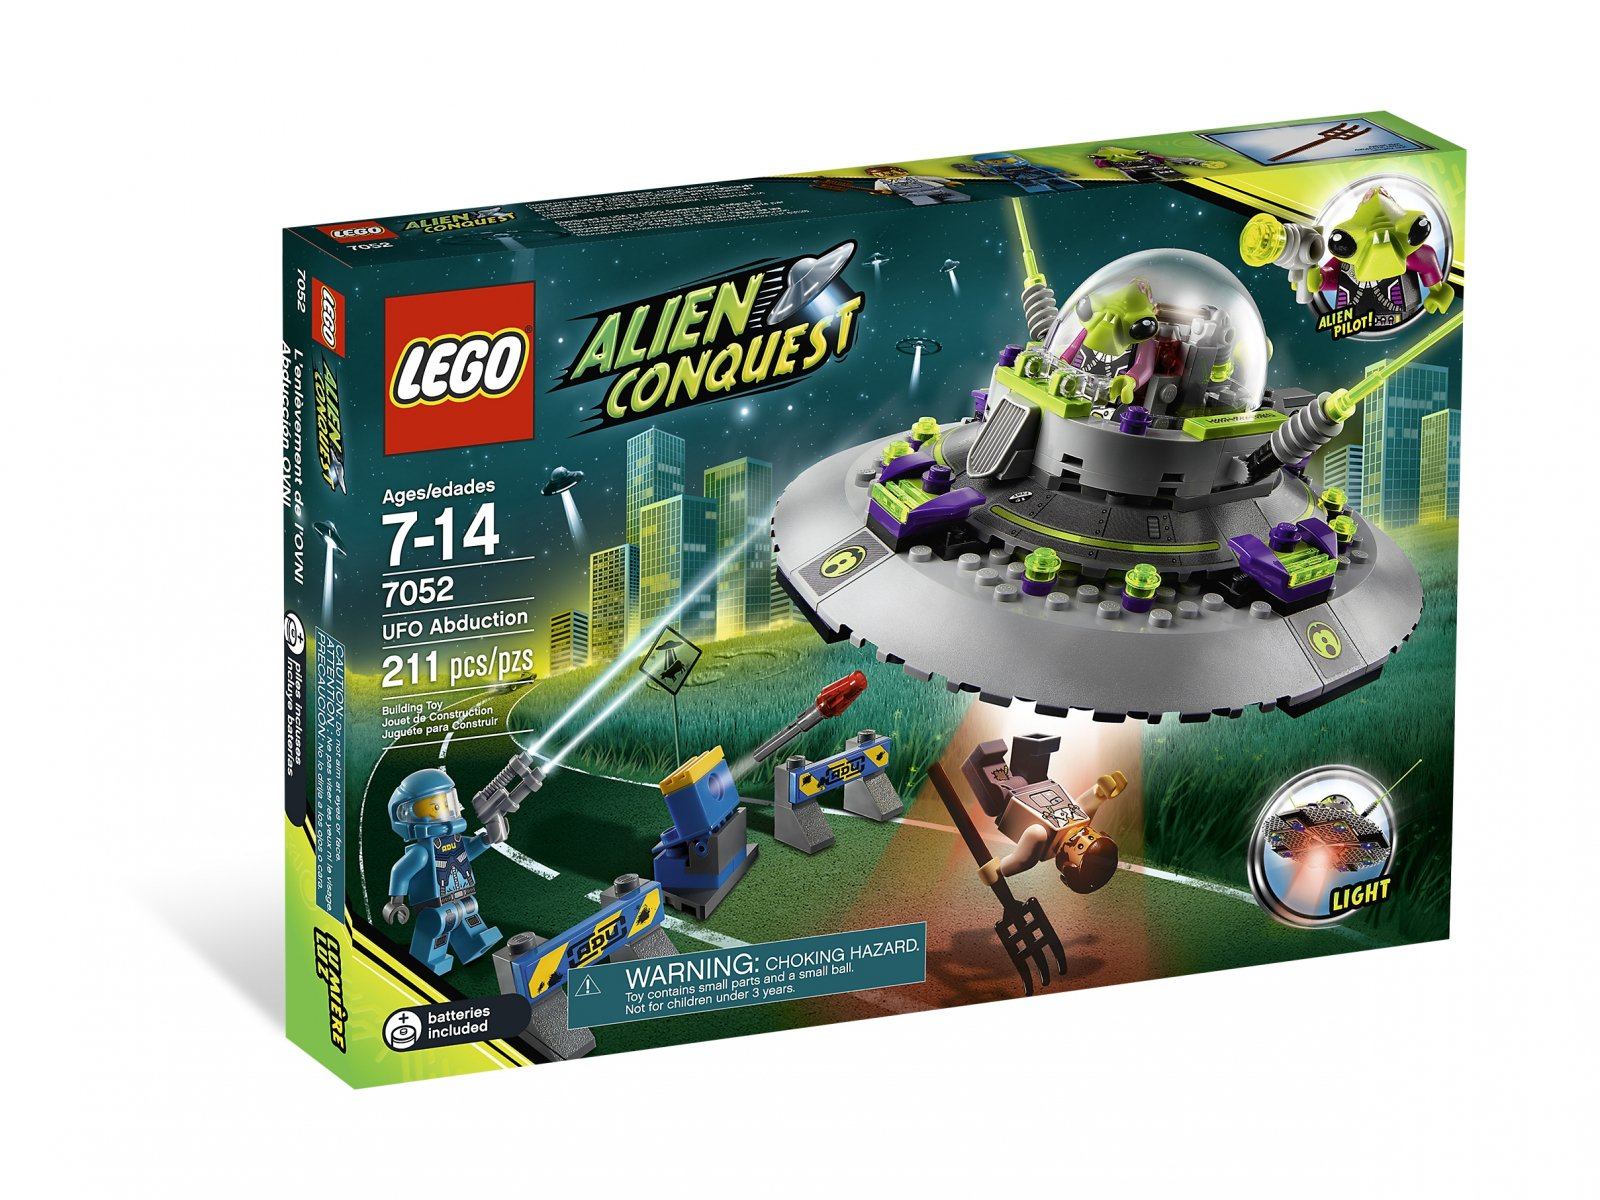 LEGO Alien Conquest UFO Abduction 7052